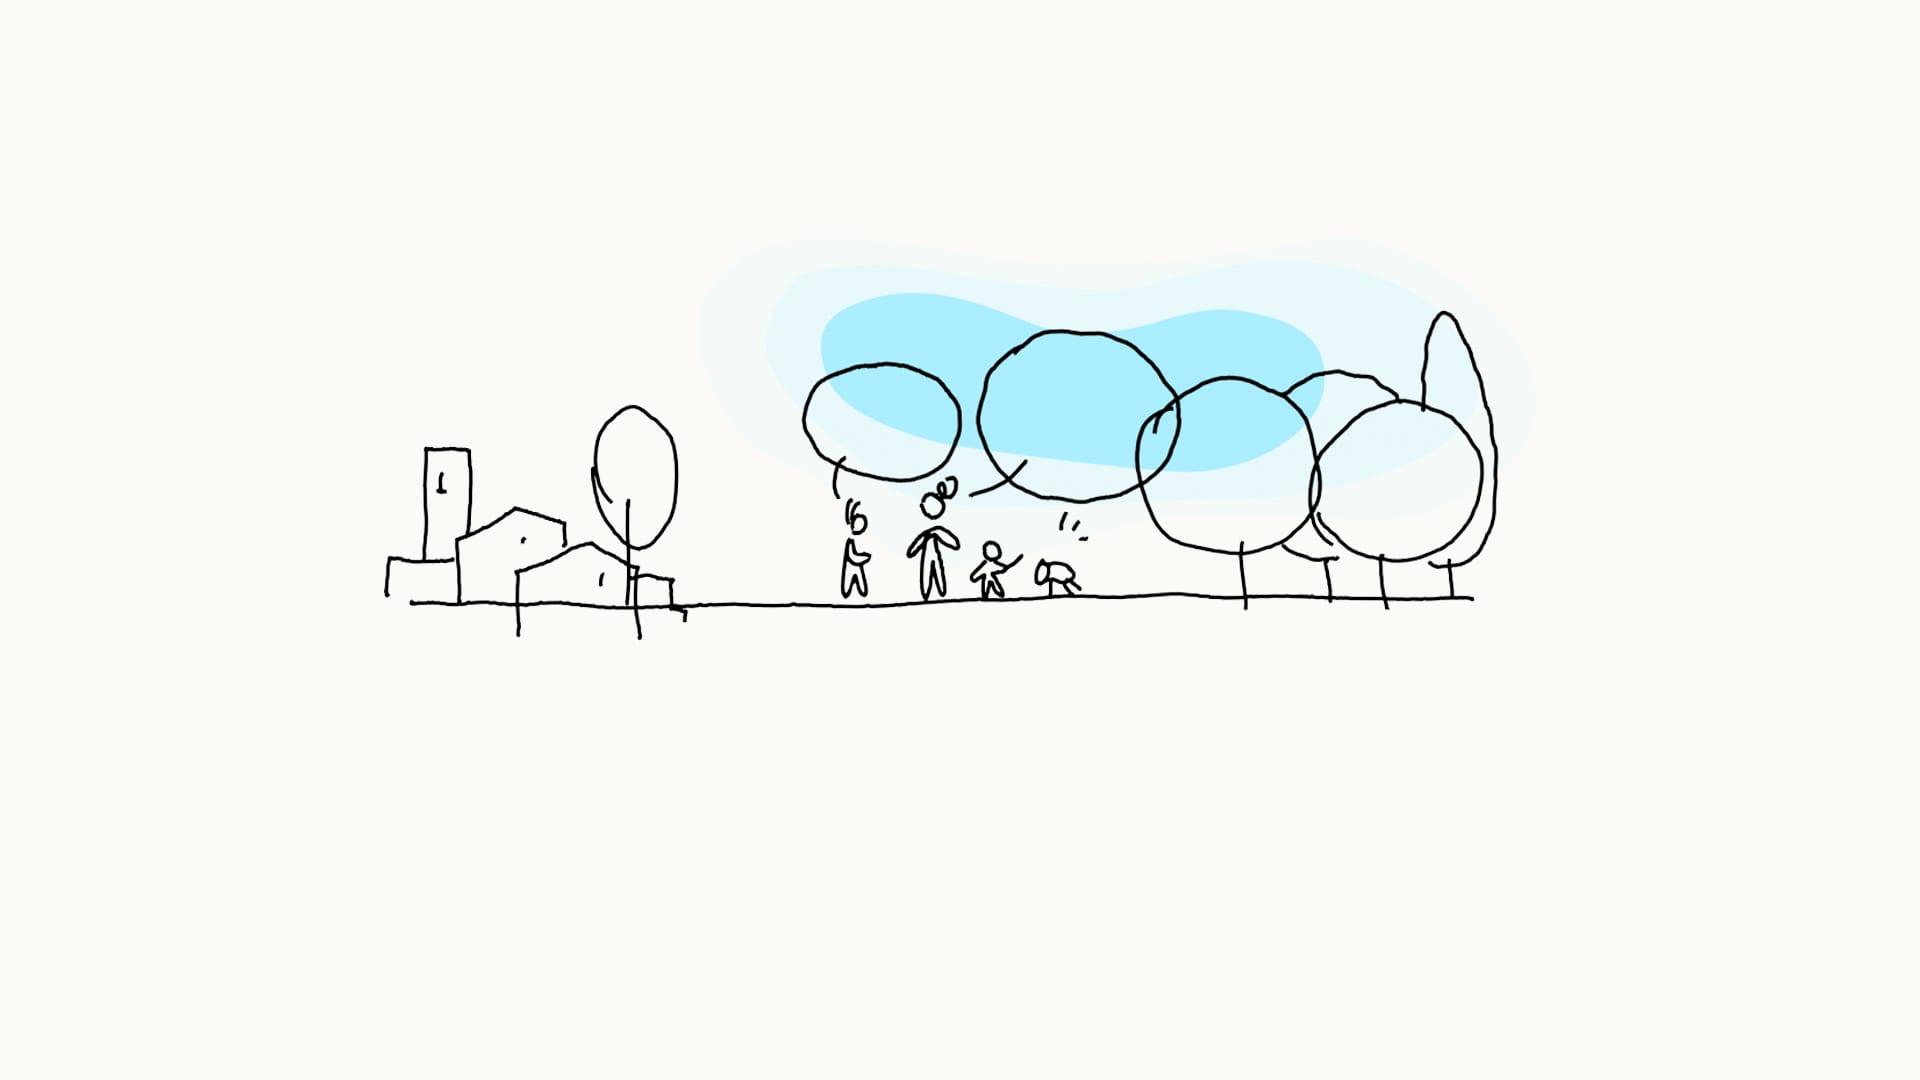 València Capital Mundial del Diseño 2022 se convierte en 'partner oficial' de la New European Bauhaus